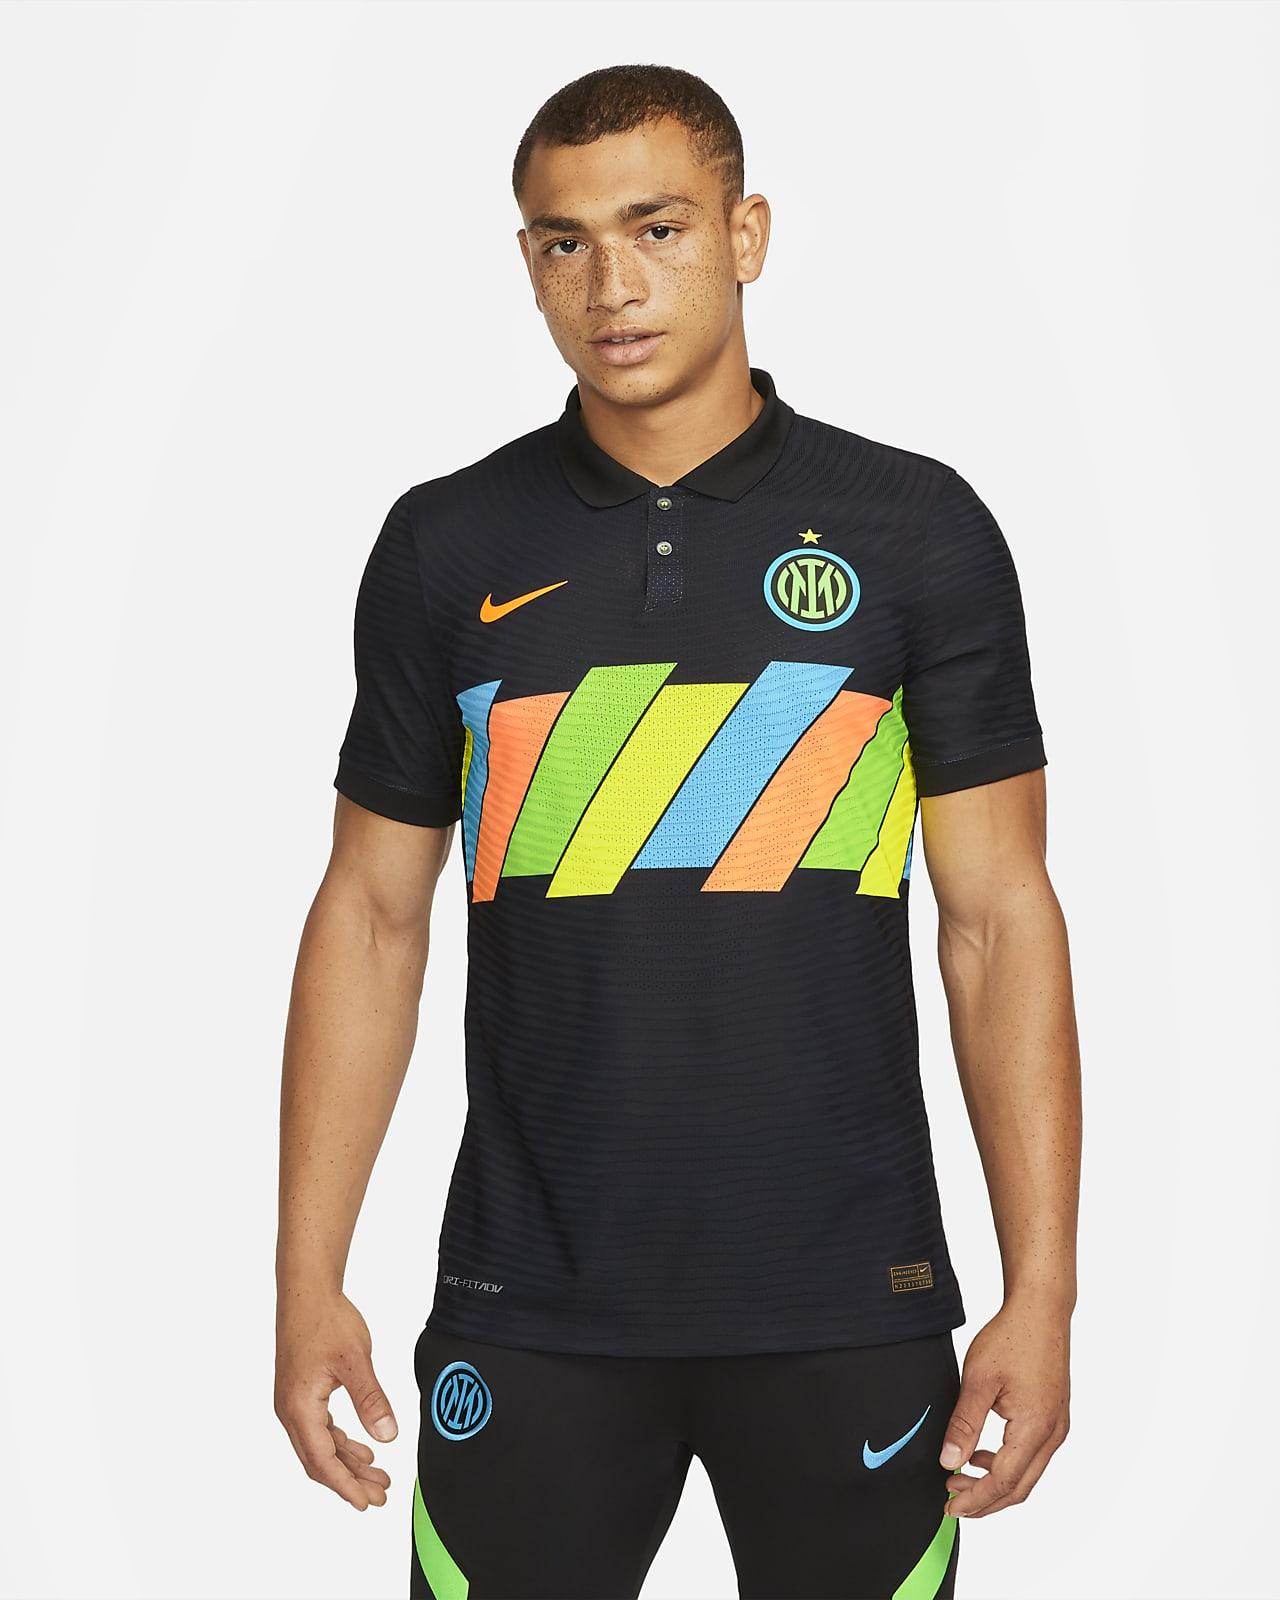 Męska koszulka piłkarska Nike Dri-FIT ADV Inter Mediolan Match 2021/22